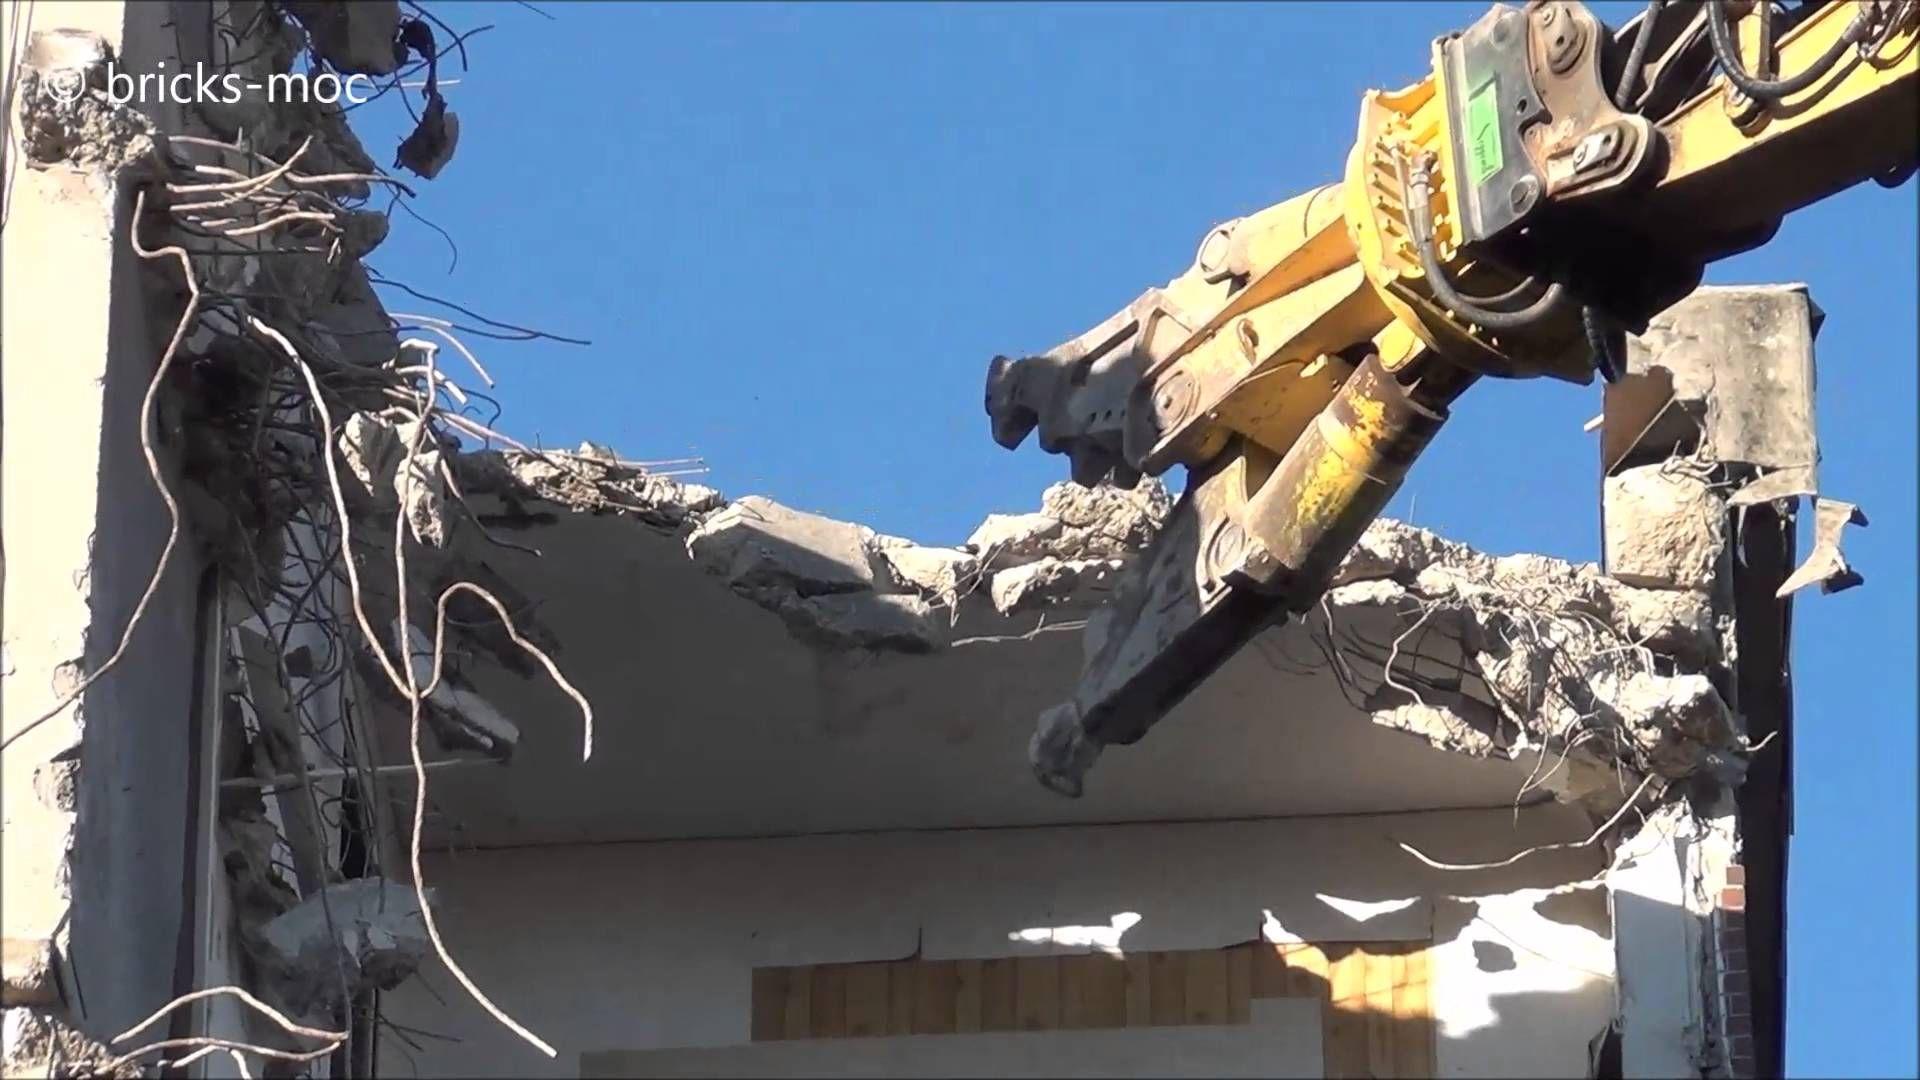 CATERPILLAR CAT345CL Excavator Longfront Hochhaus Abriss Duisburg Rheinh...